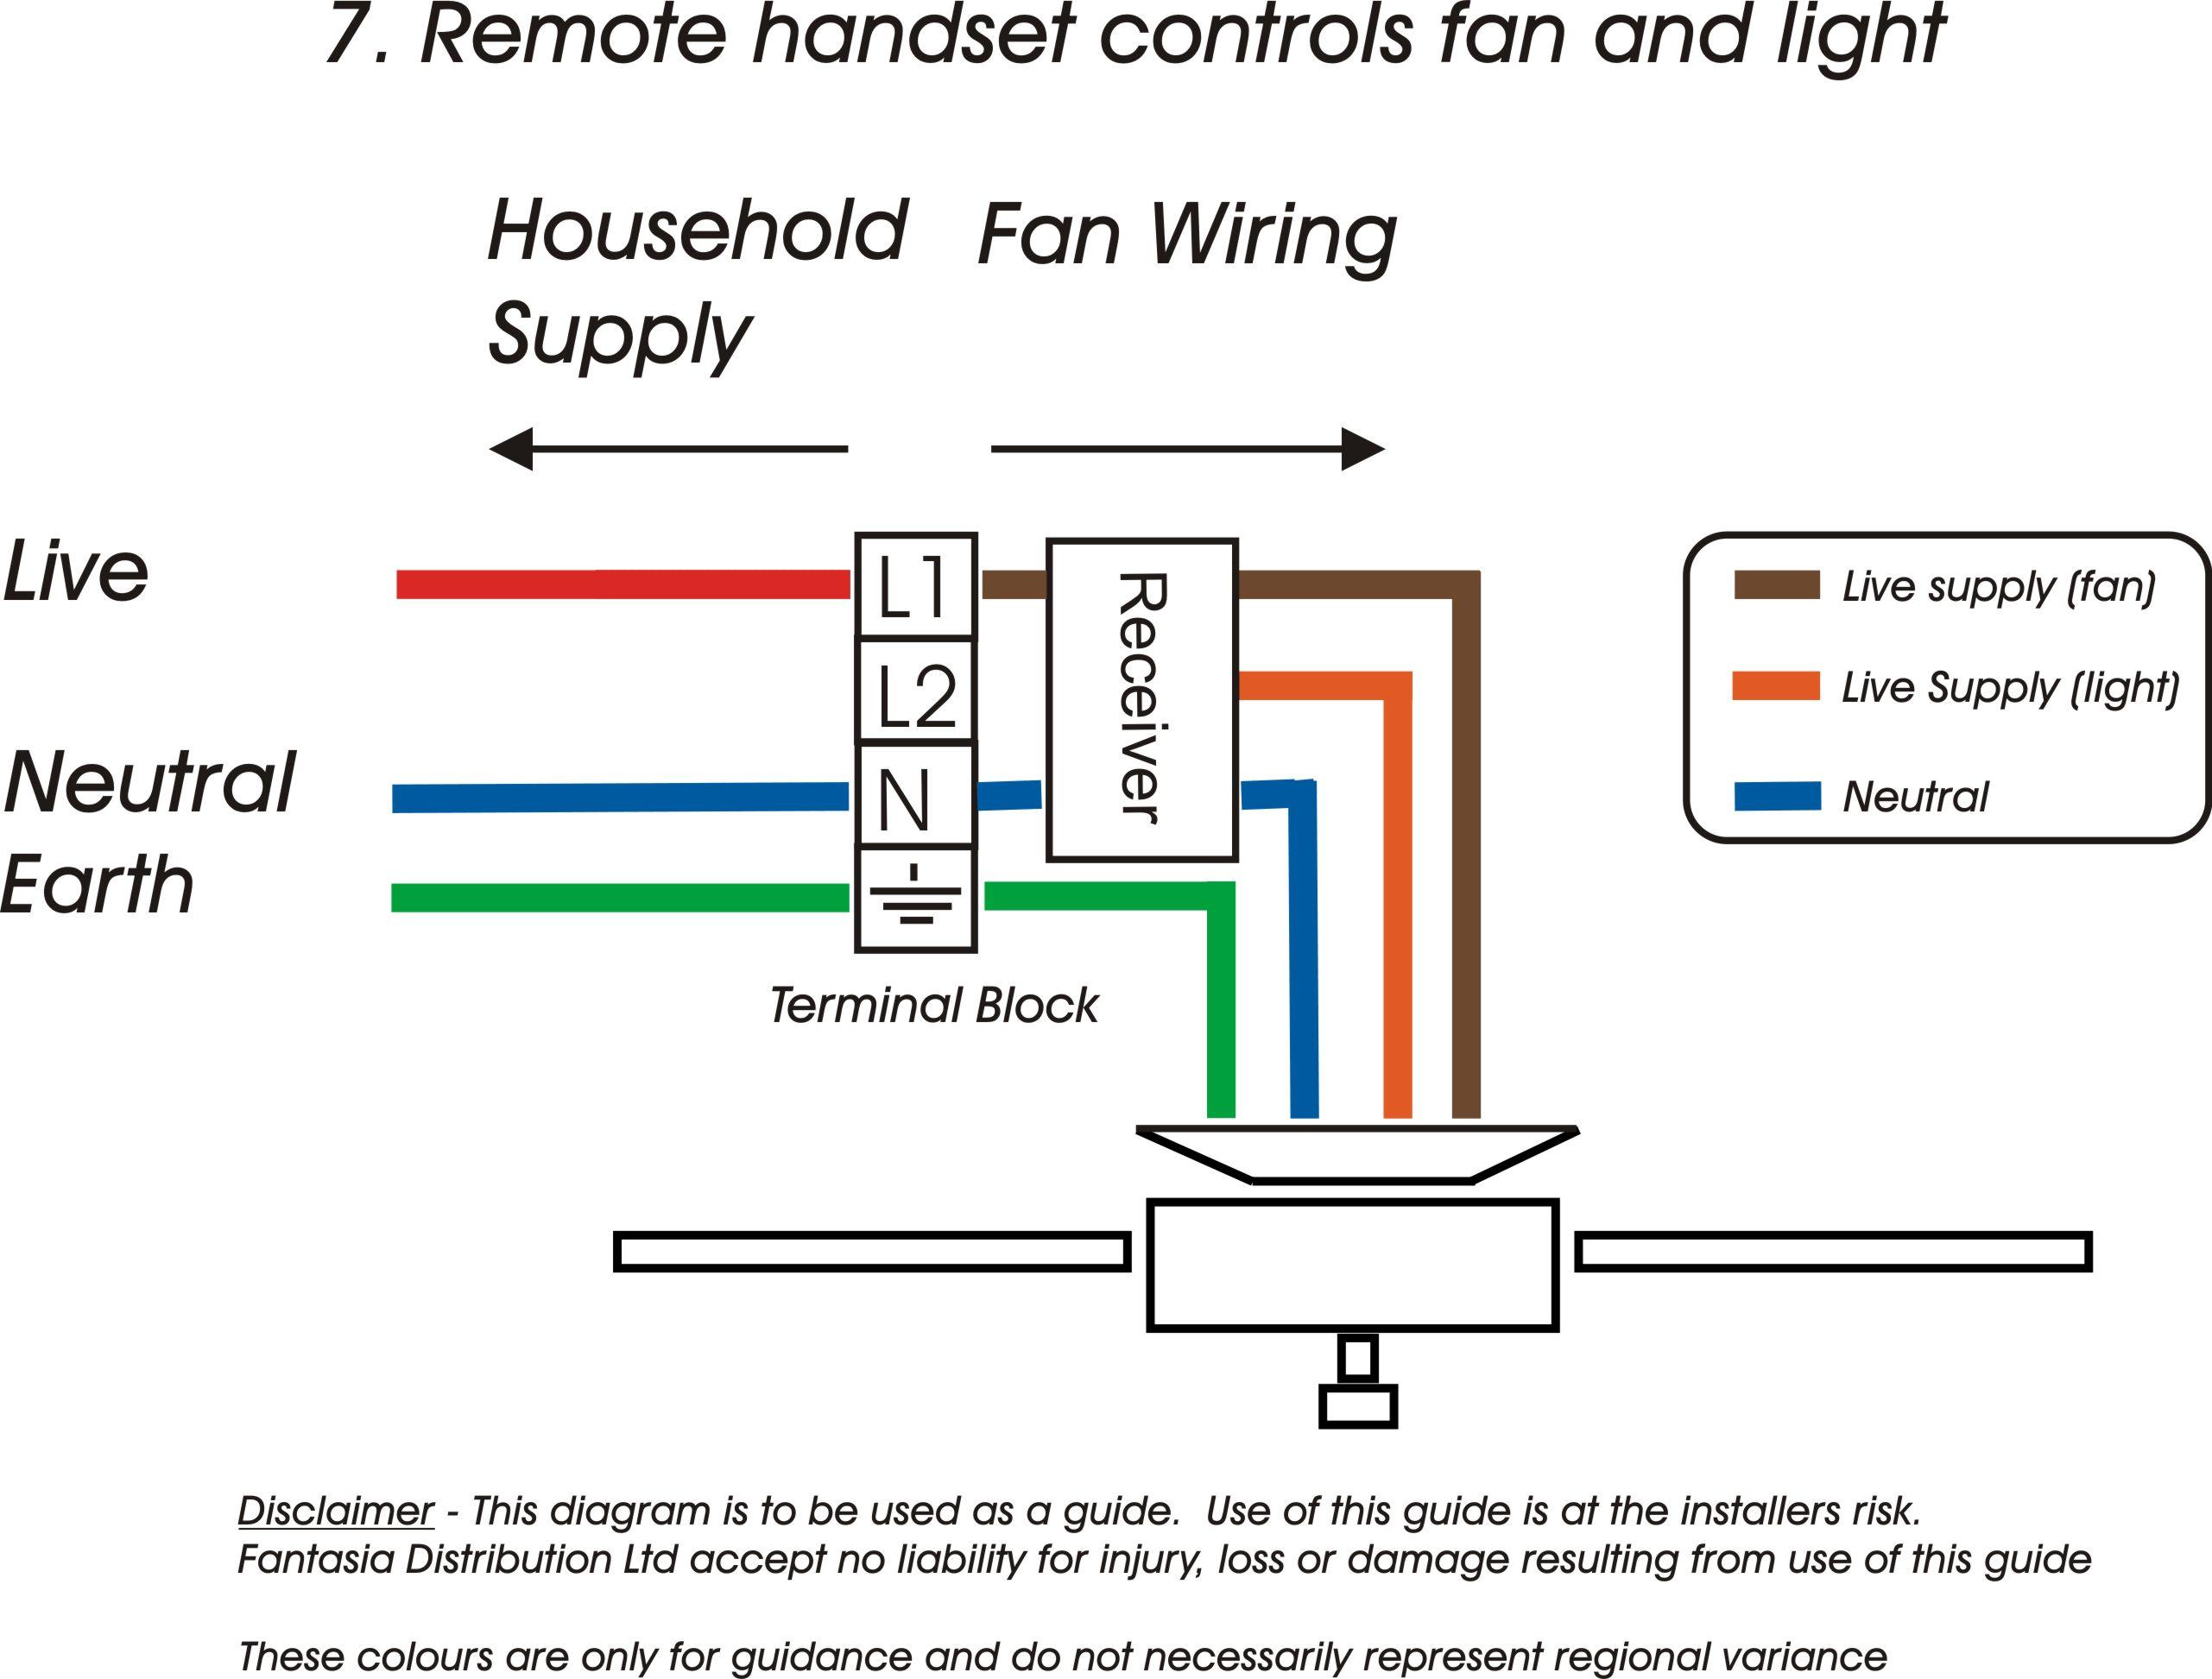 Ceiling Fan Light Internal Wiring Schematic | Wiring Diagram - Ceiling Fan Internal Wiring Diagram